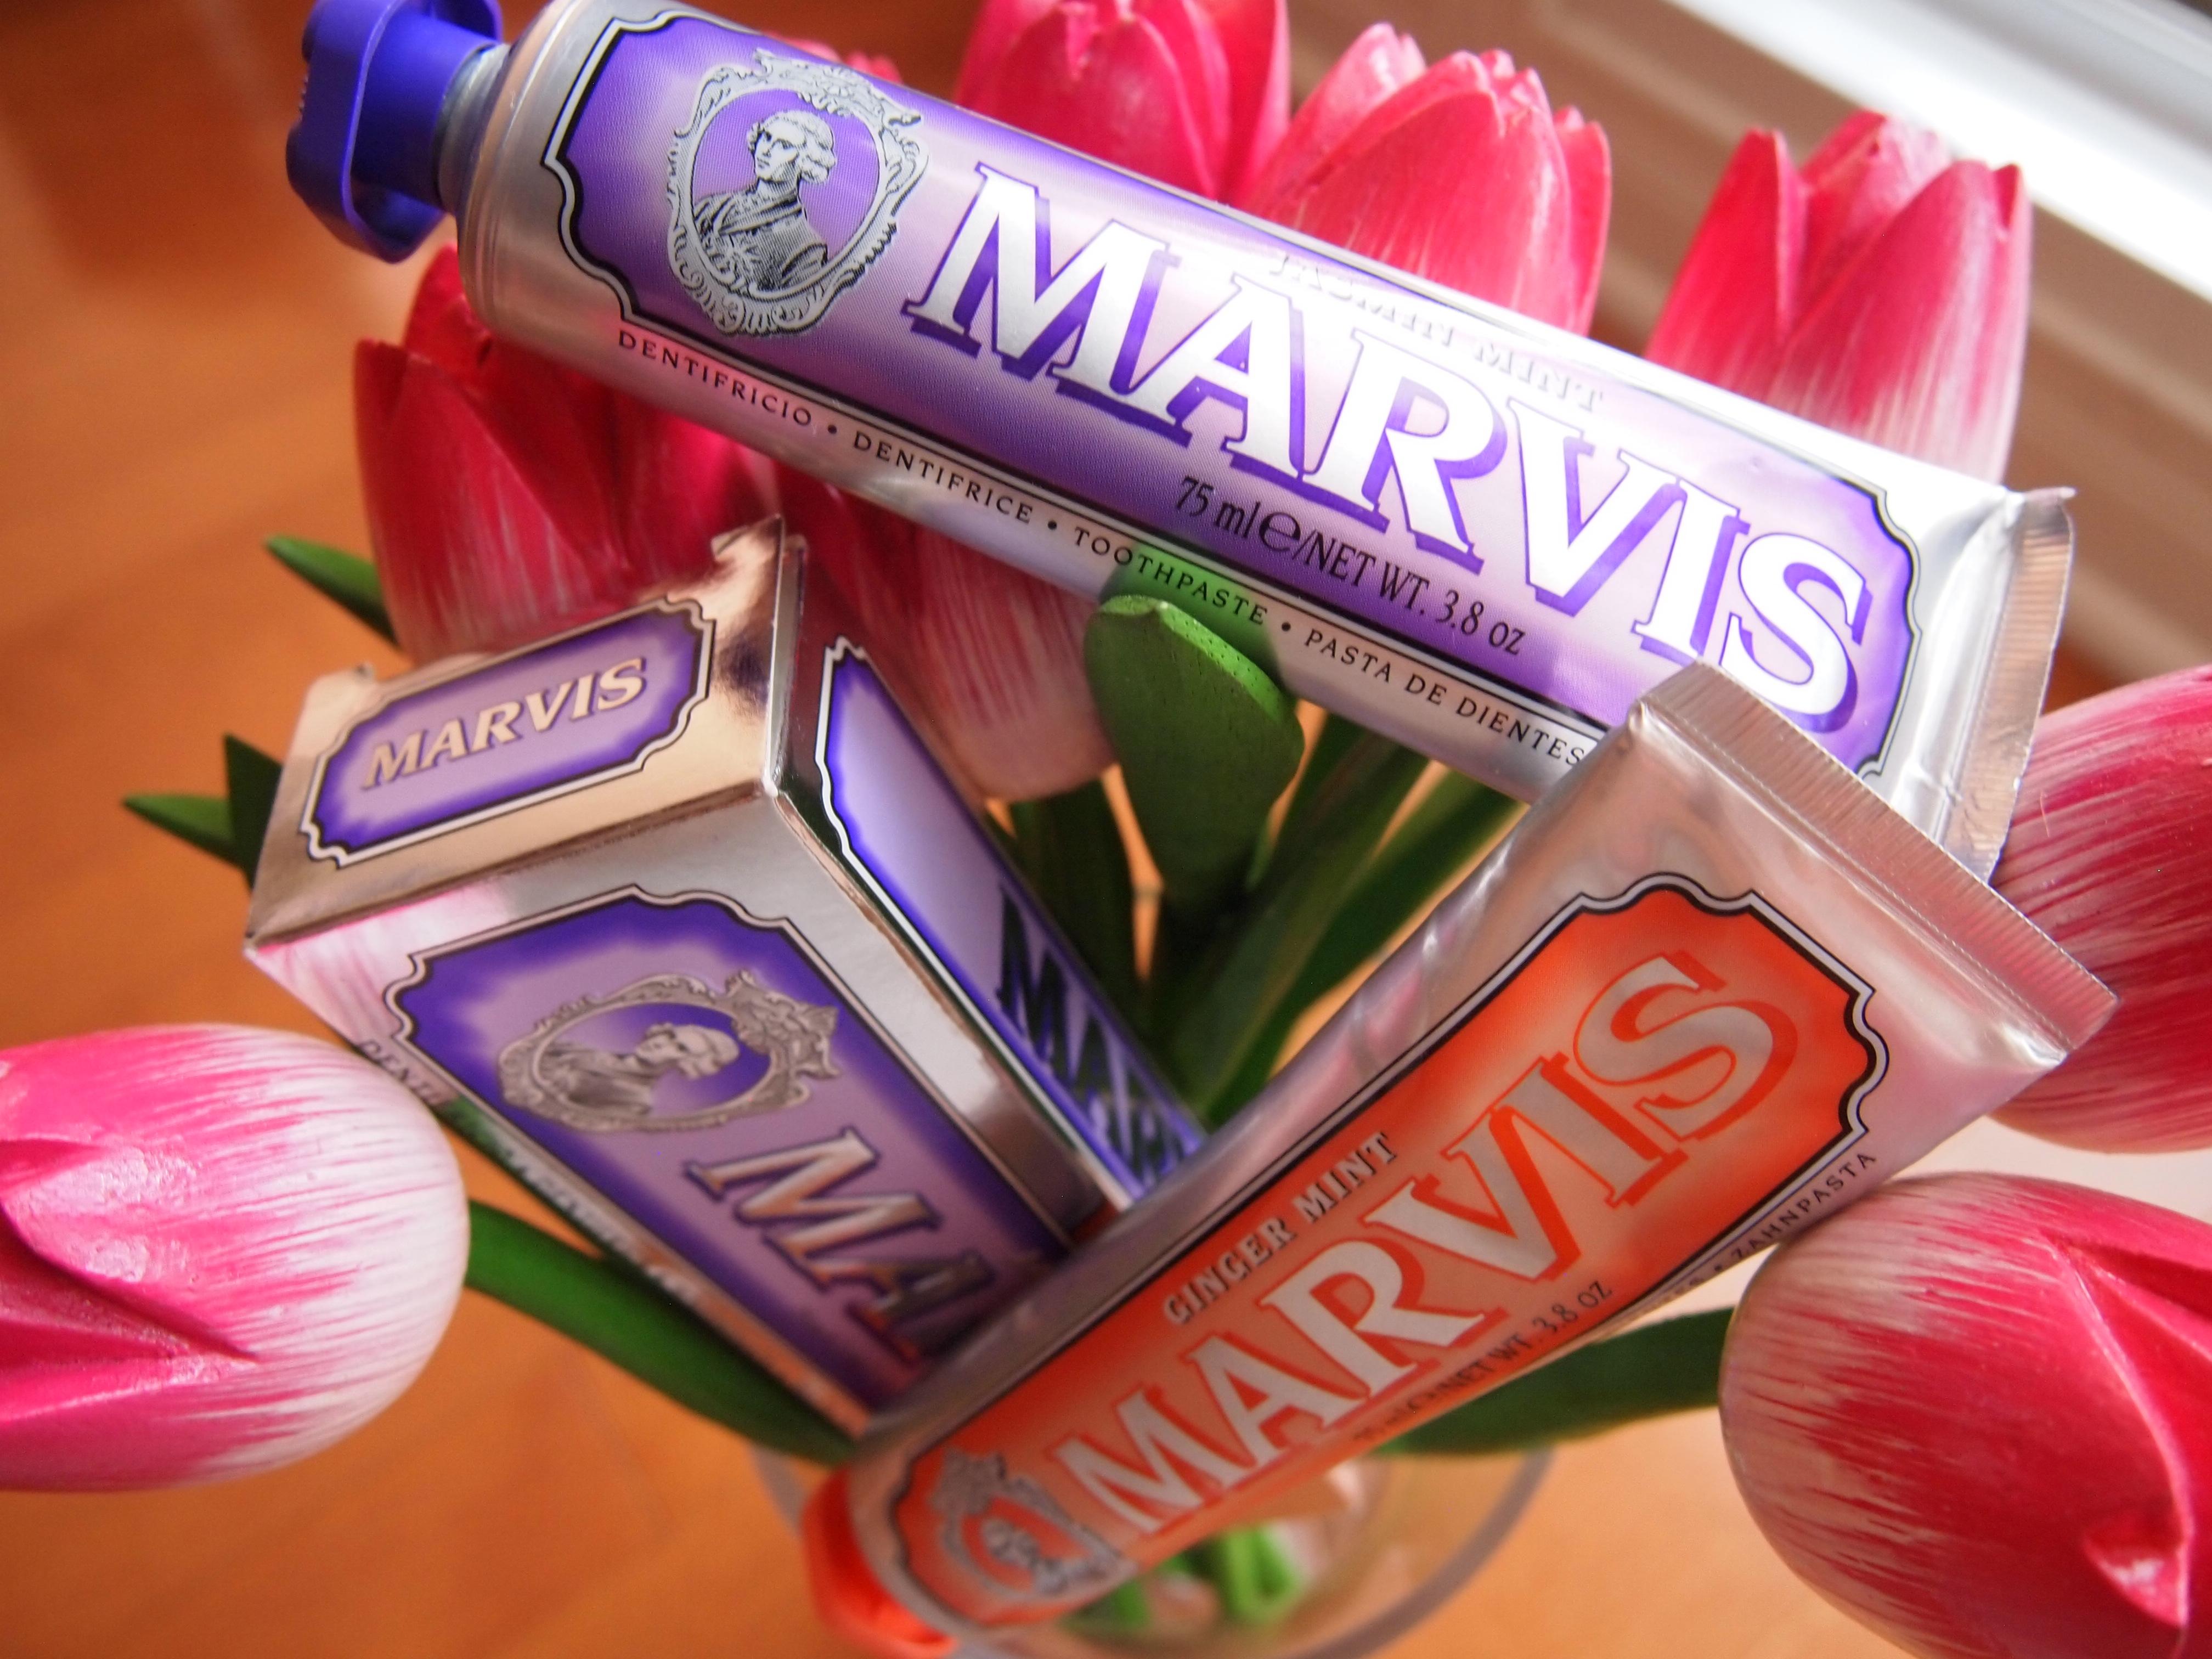 Marvis: Brushing teeth is stylish now